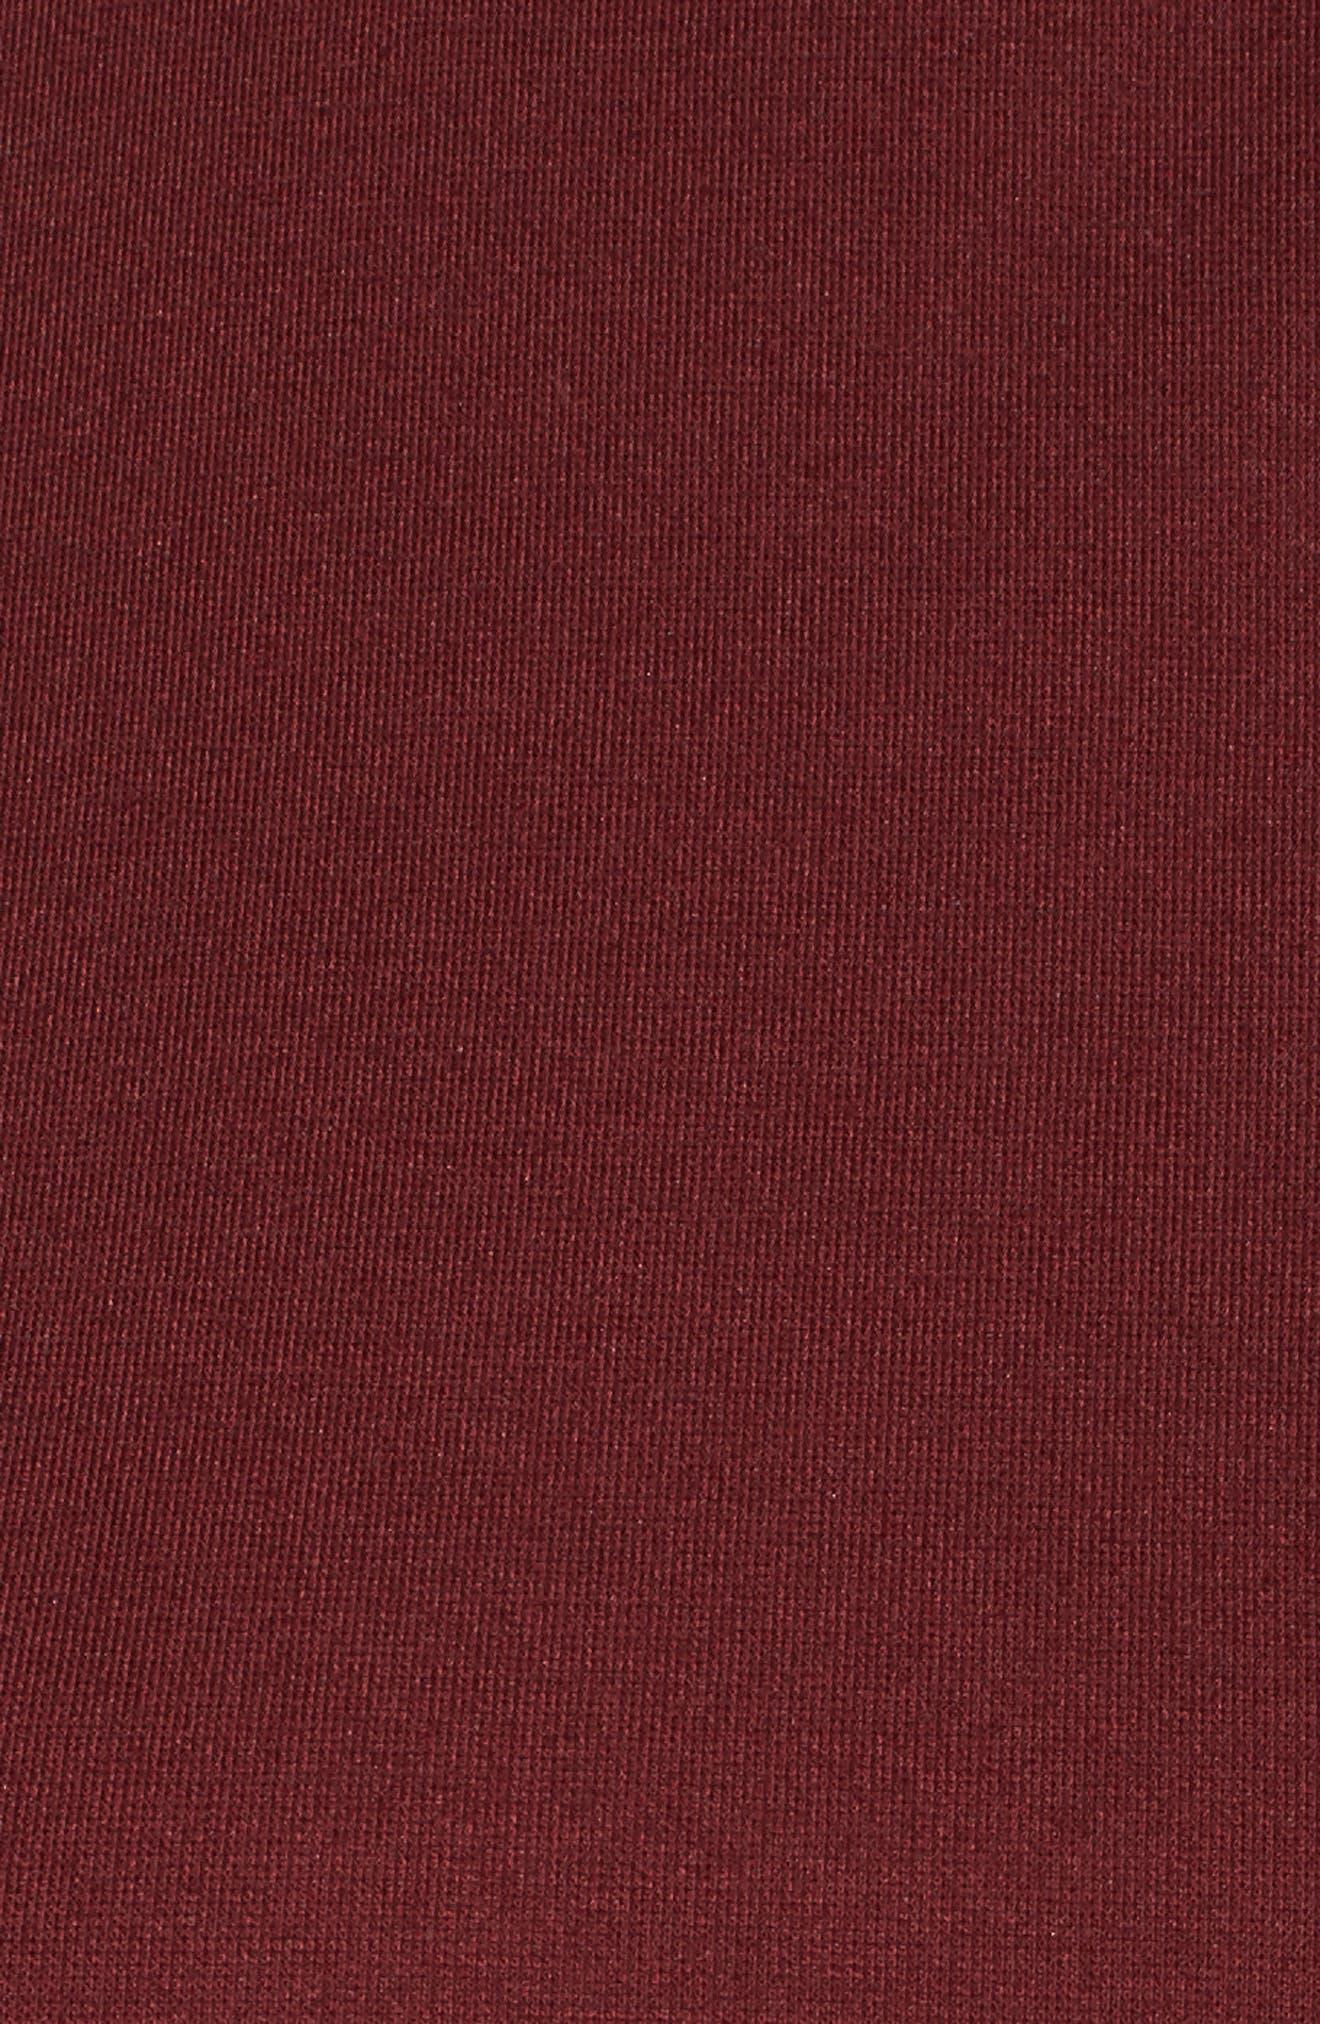 Chiffon Hem Top,                             Alternate thumbnail 5, color,                             601